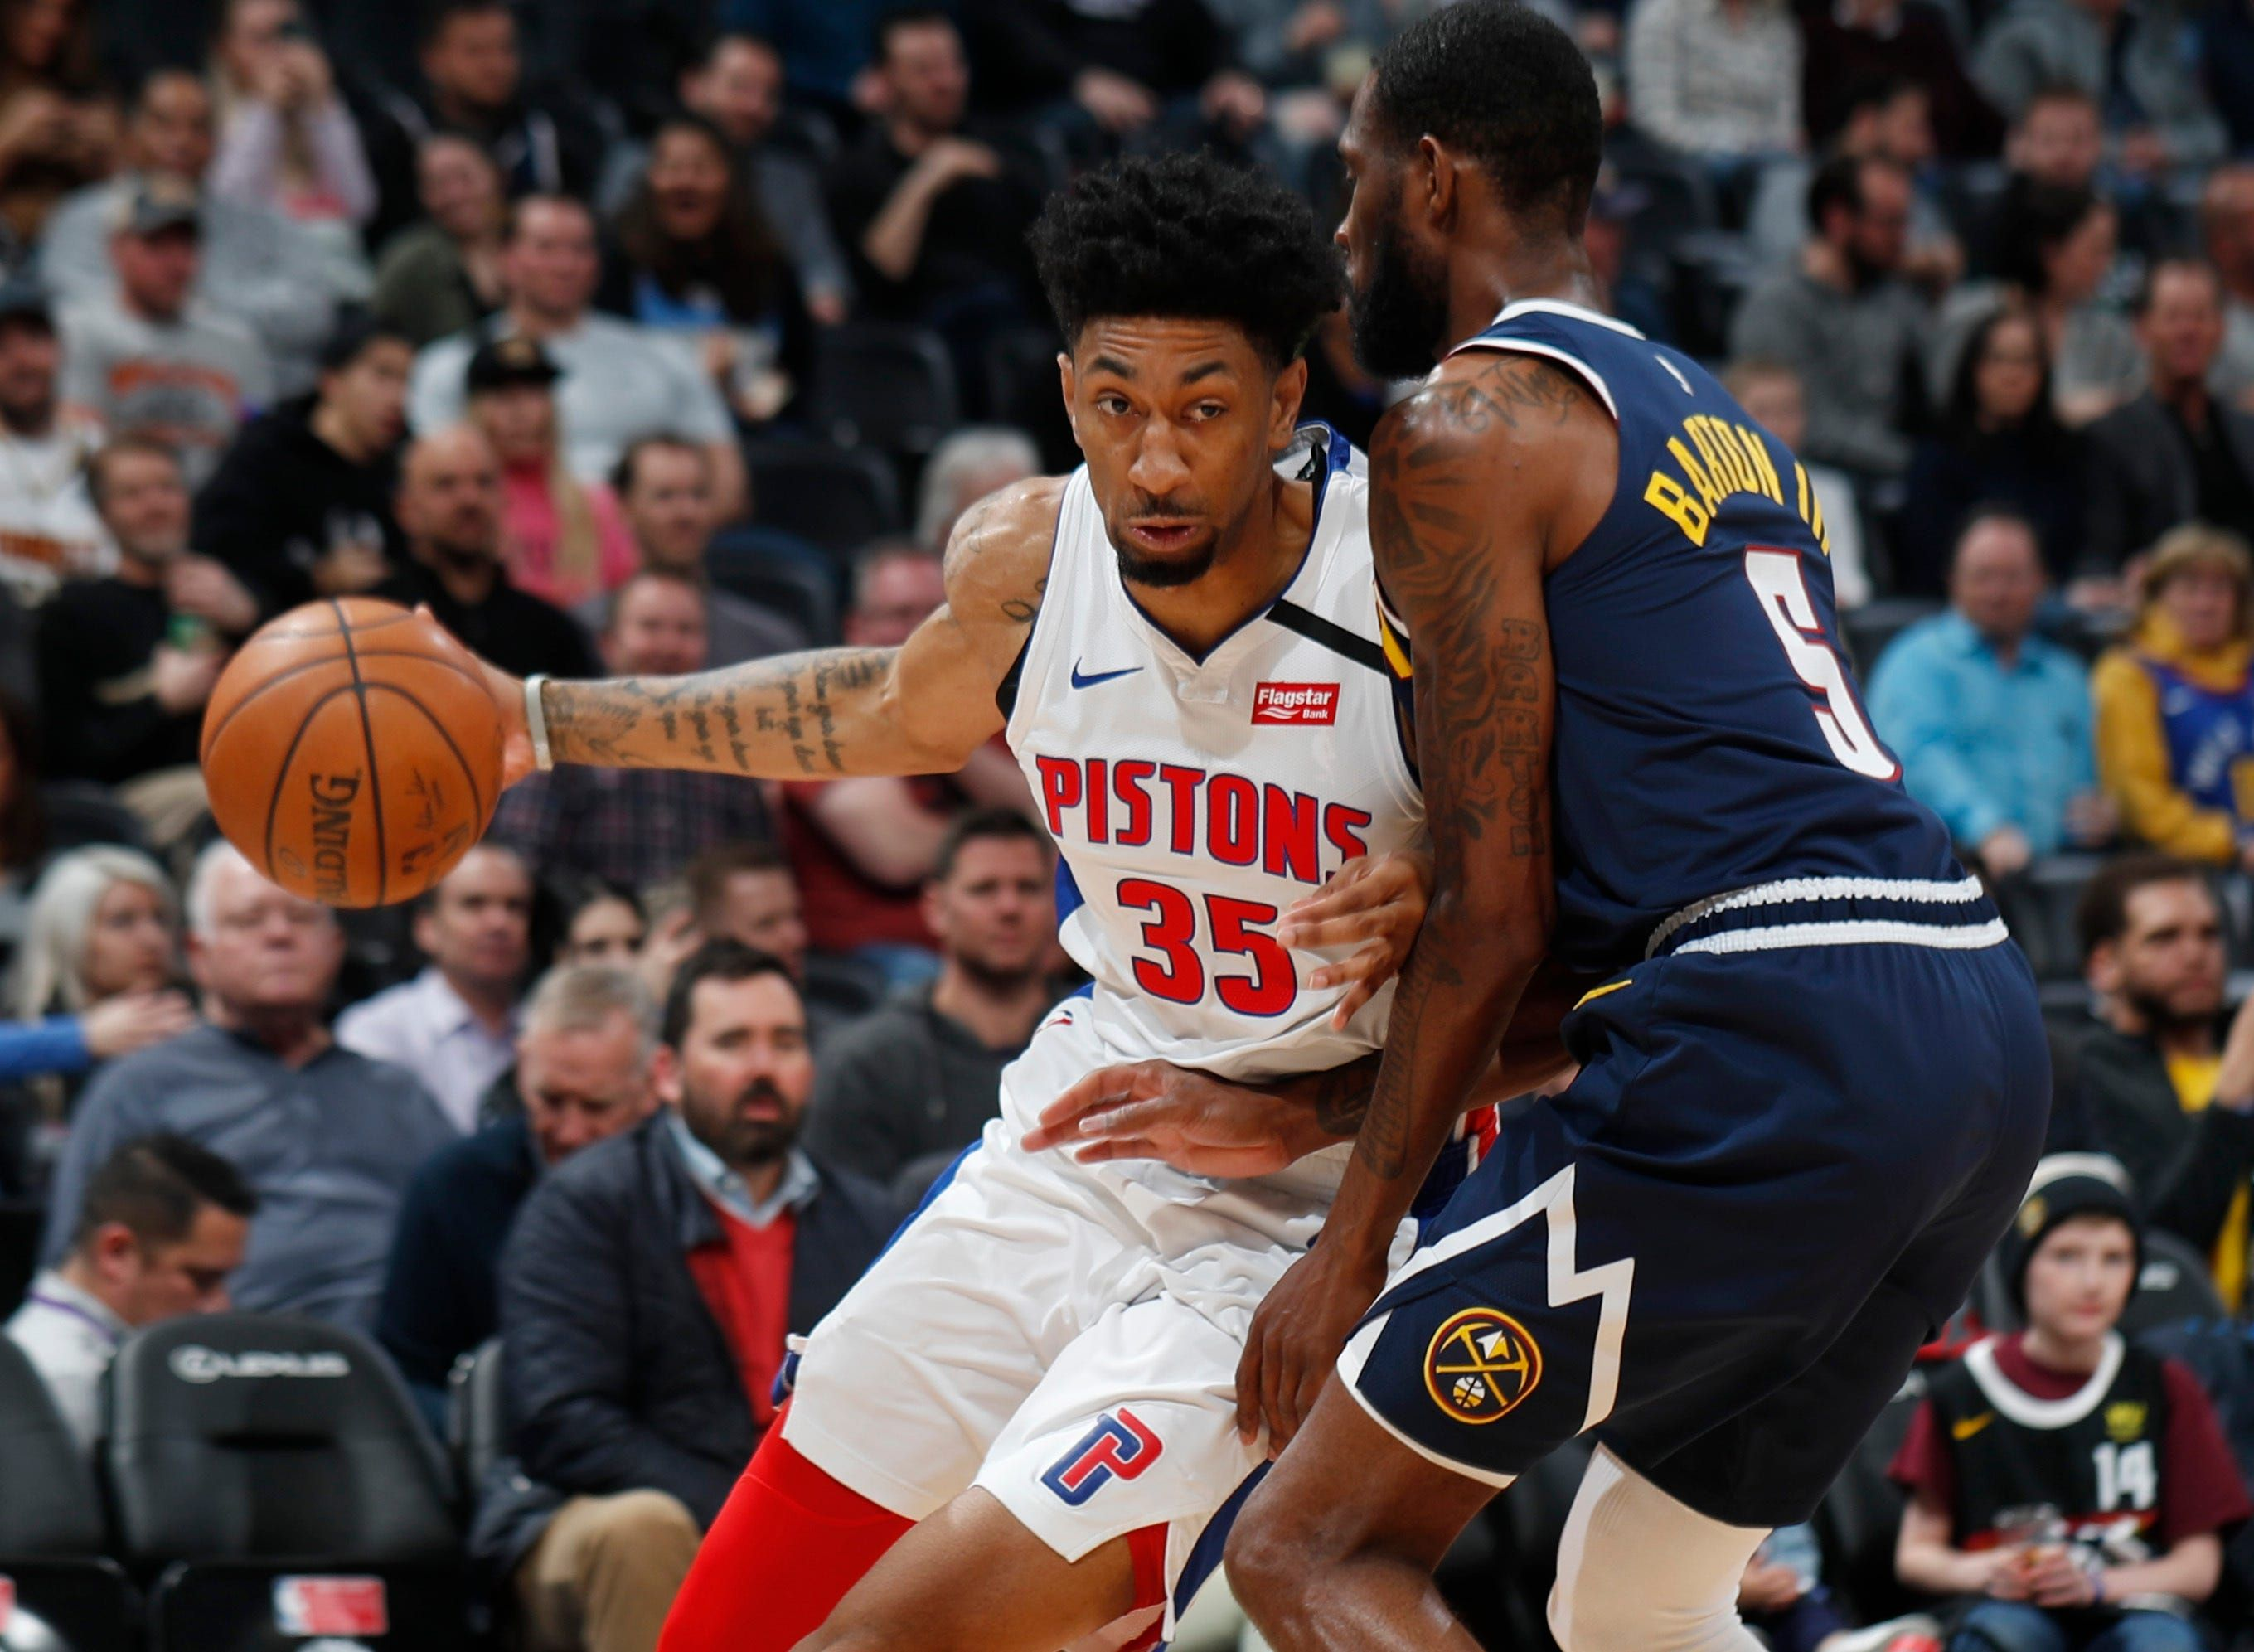 Detroit Pistons 2019 20 Season Report Card Exemplifies Uneven Losing Season In 2020 Detroit Pistons Michigan Sports Pistons